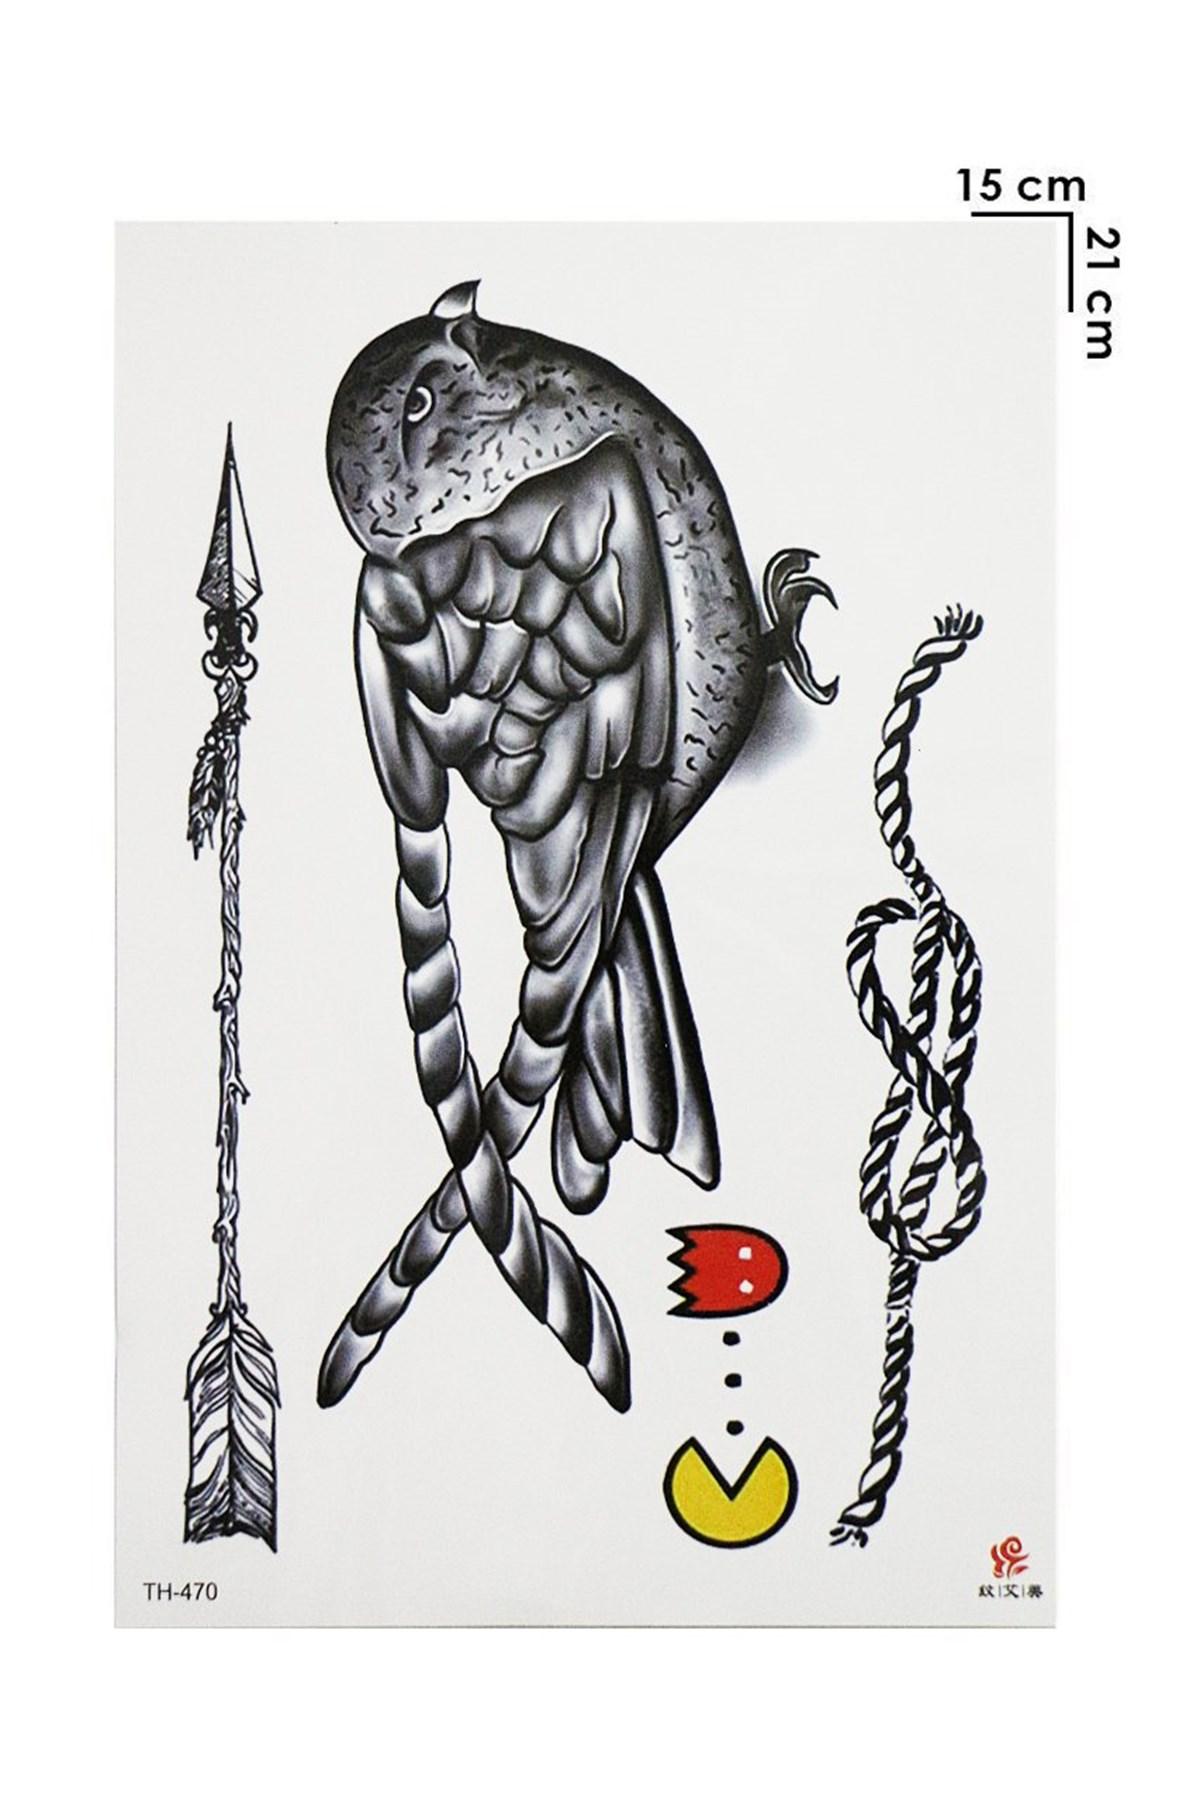 Bird, Rope & Arrow Model Temporary Tattoo